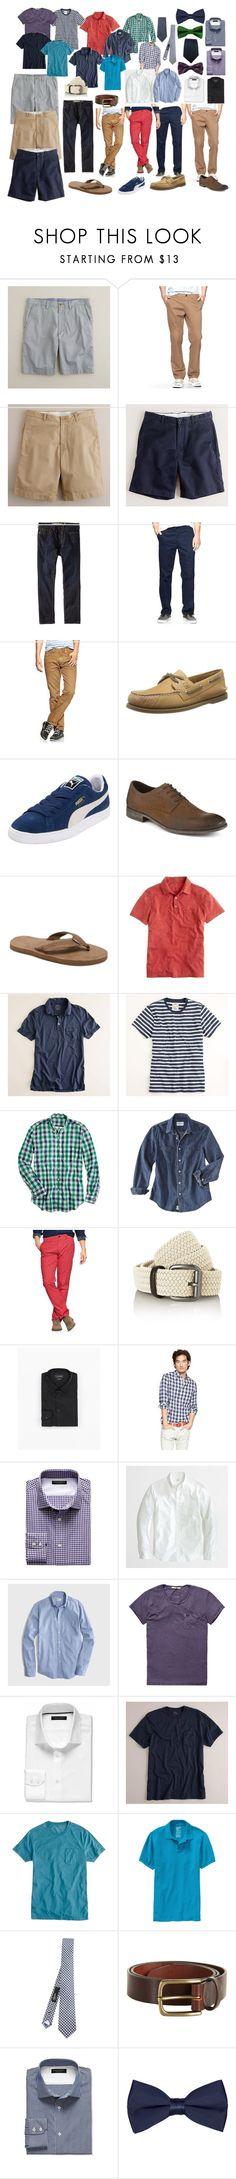 Men's Summer Capsule Wardrobe - Casual + Business Casual by pearlsandcupcakes on Polyvore featuring moda, J.Crew, Puma, Clarks, MANGO, Gap, Old Navy, Scotch & Soda, Banana Republic and Zara